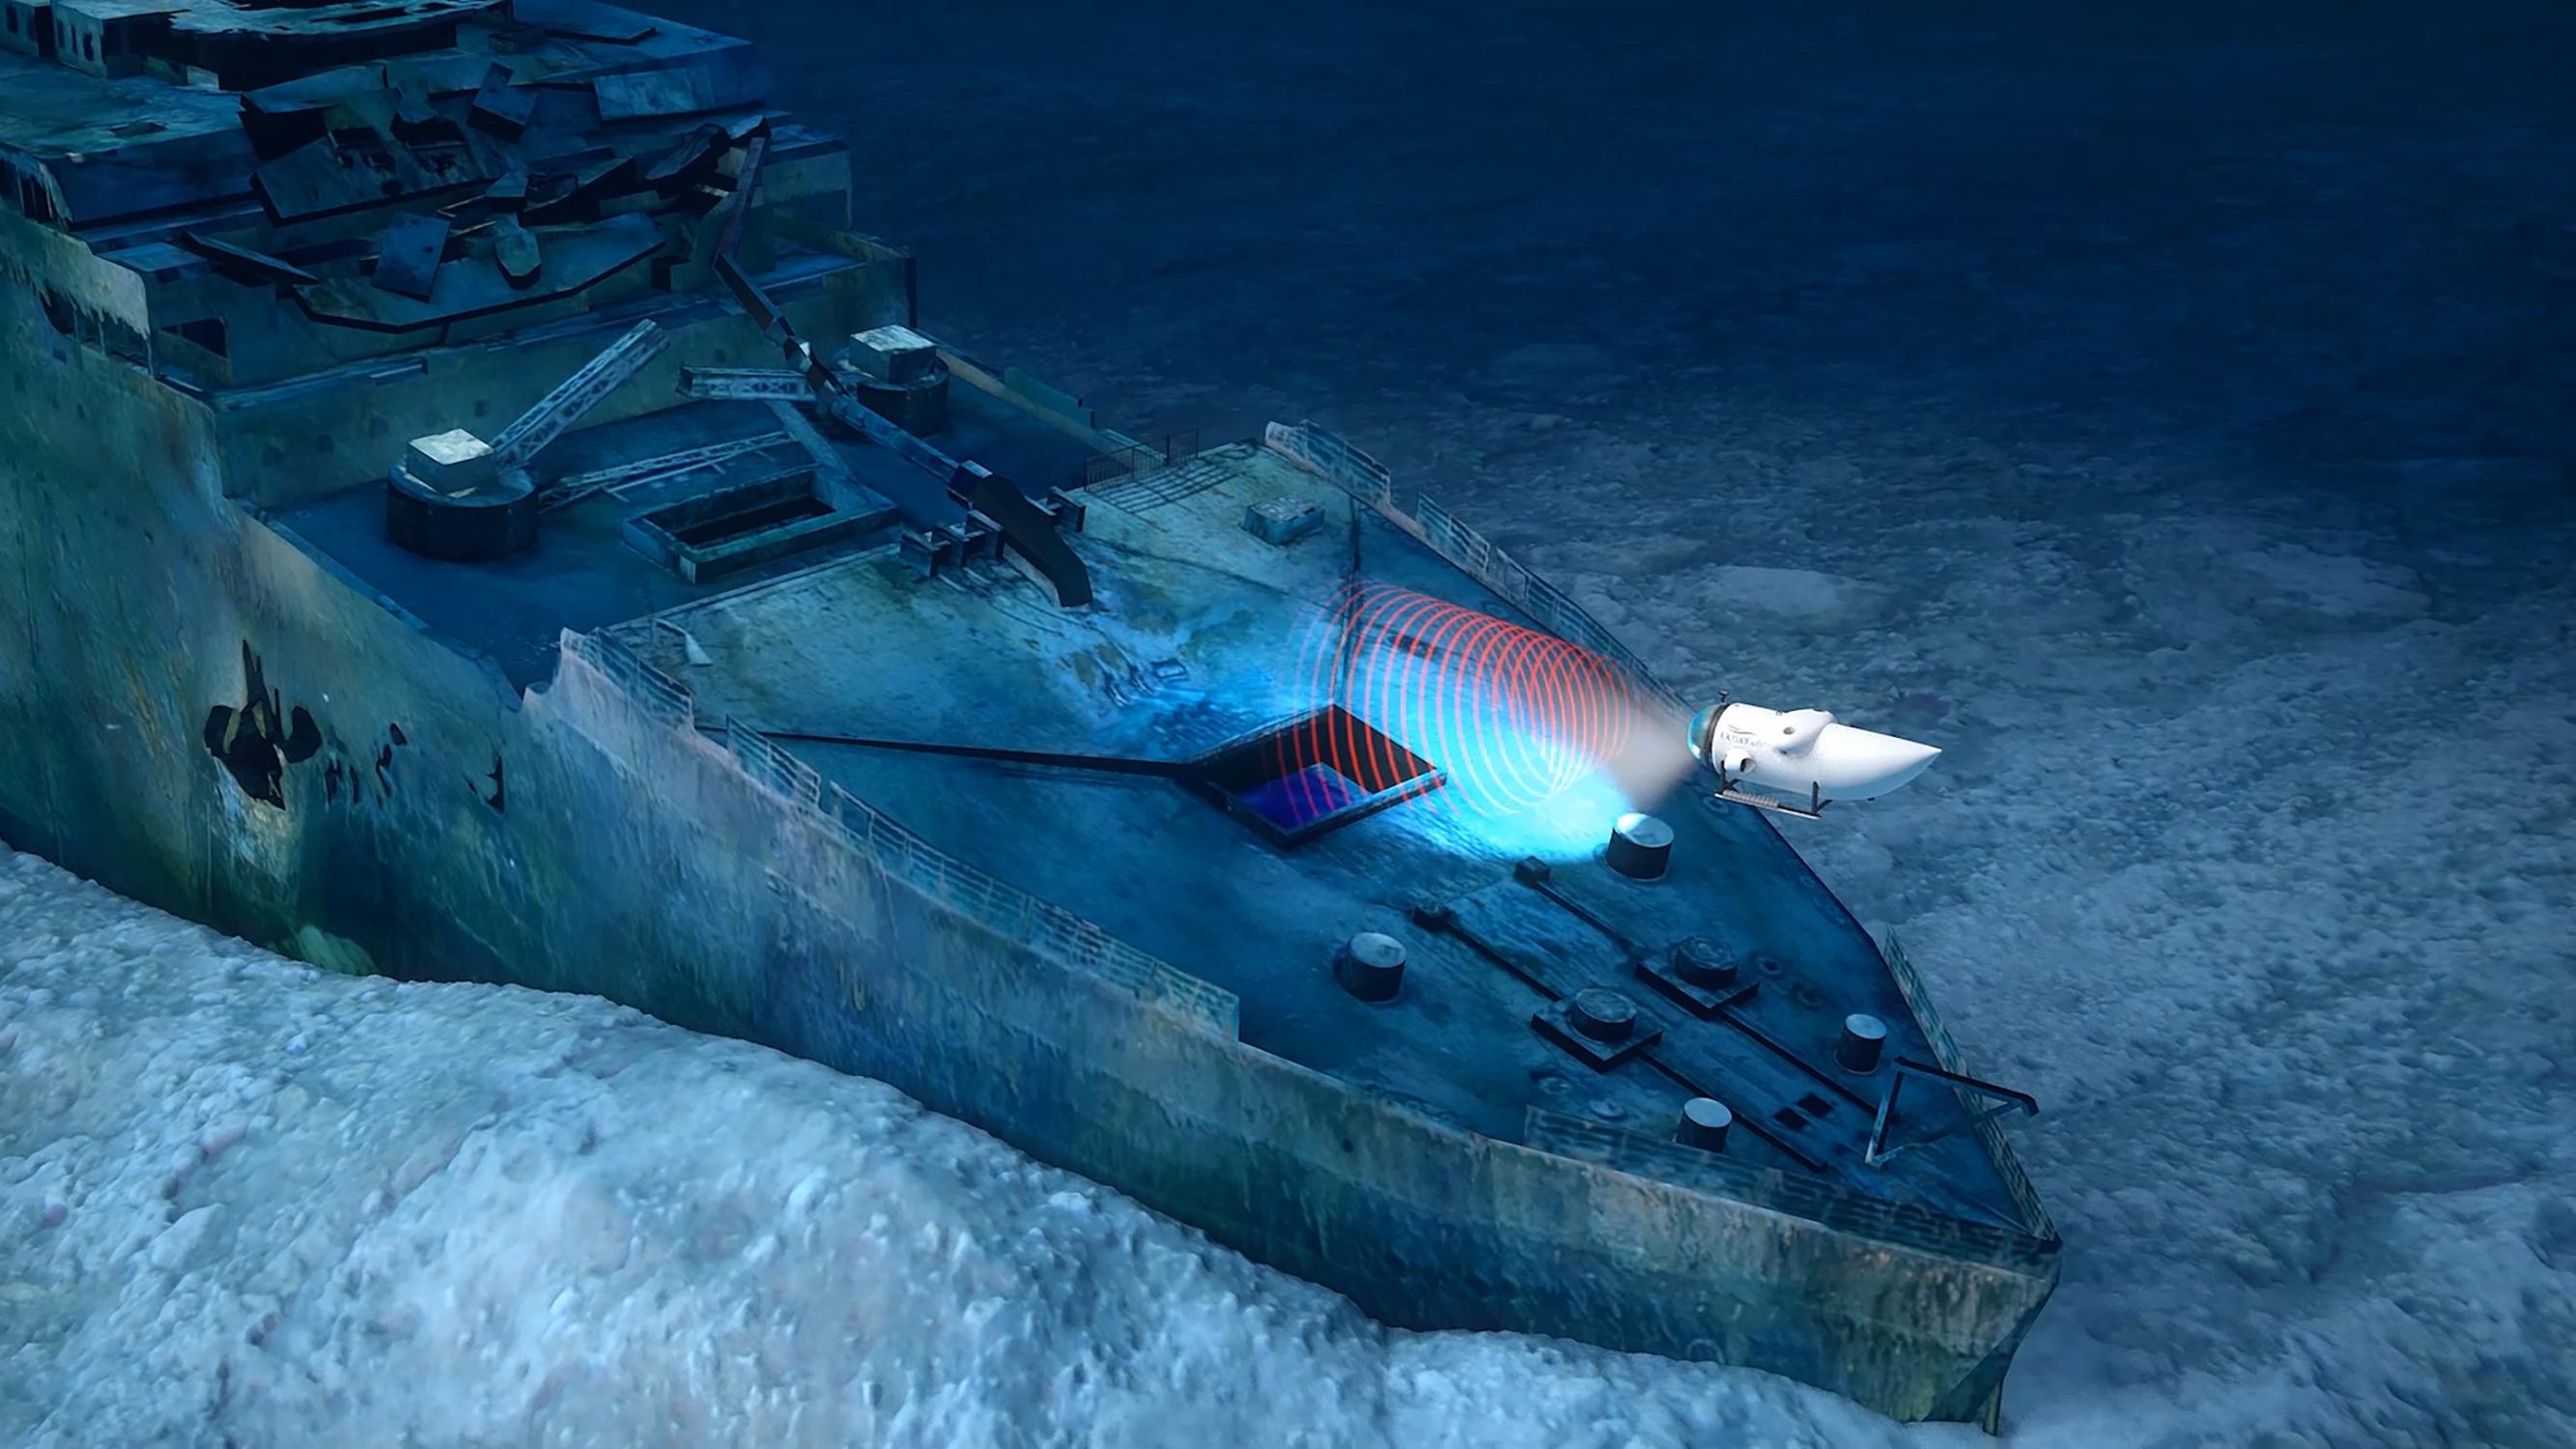 Illustration by Andrea Gatti—Titanic Survey Expedition